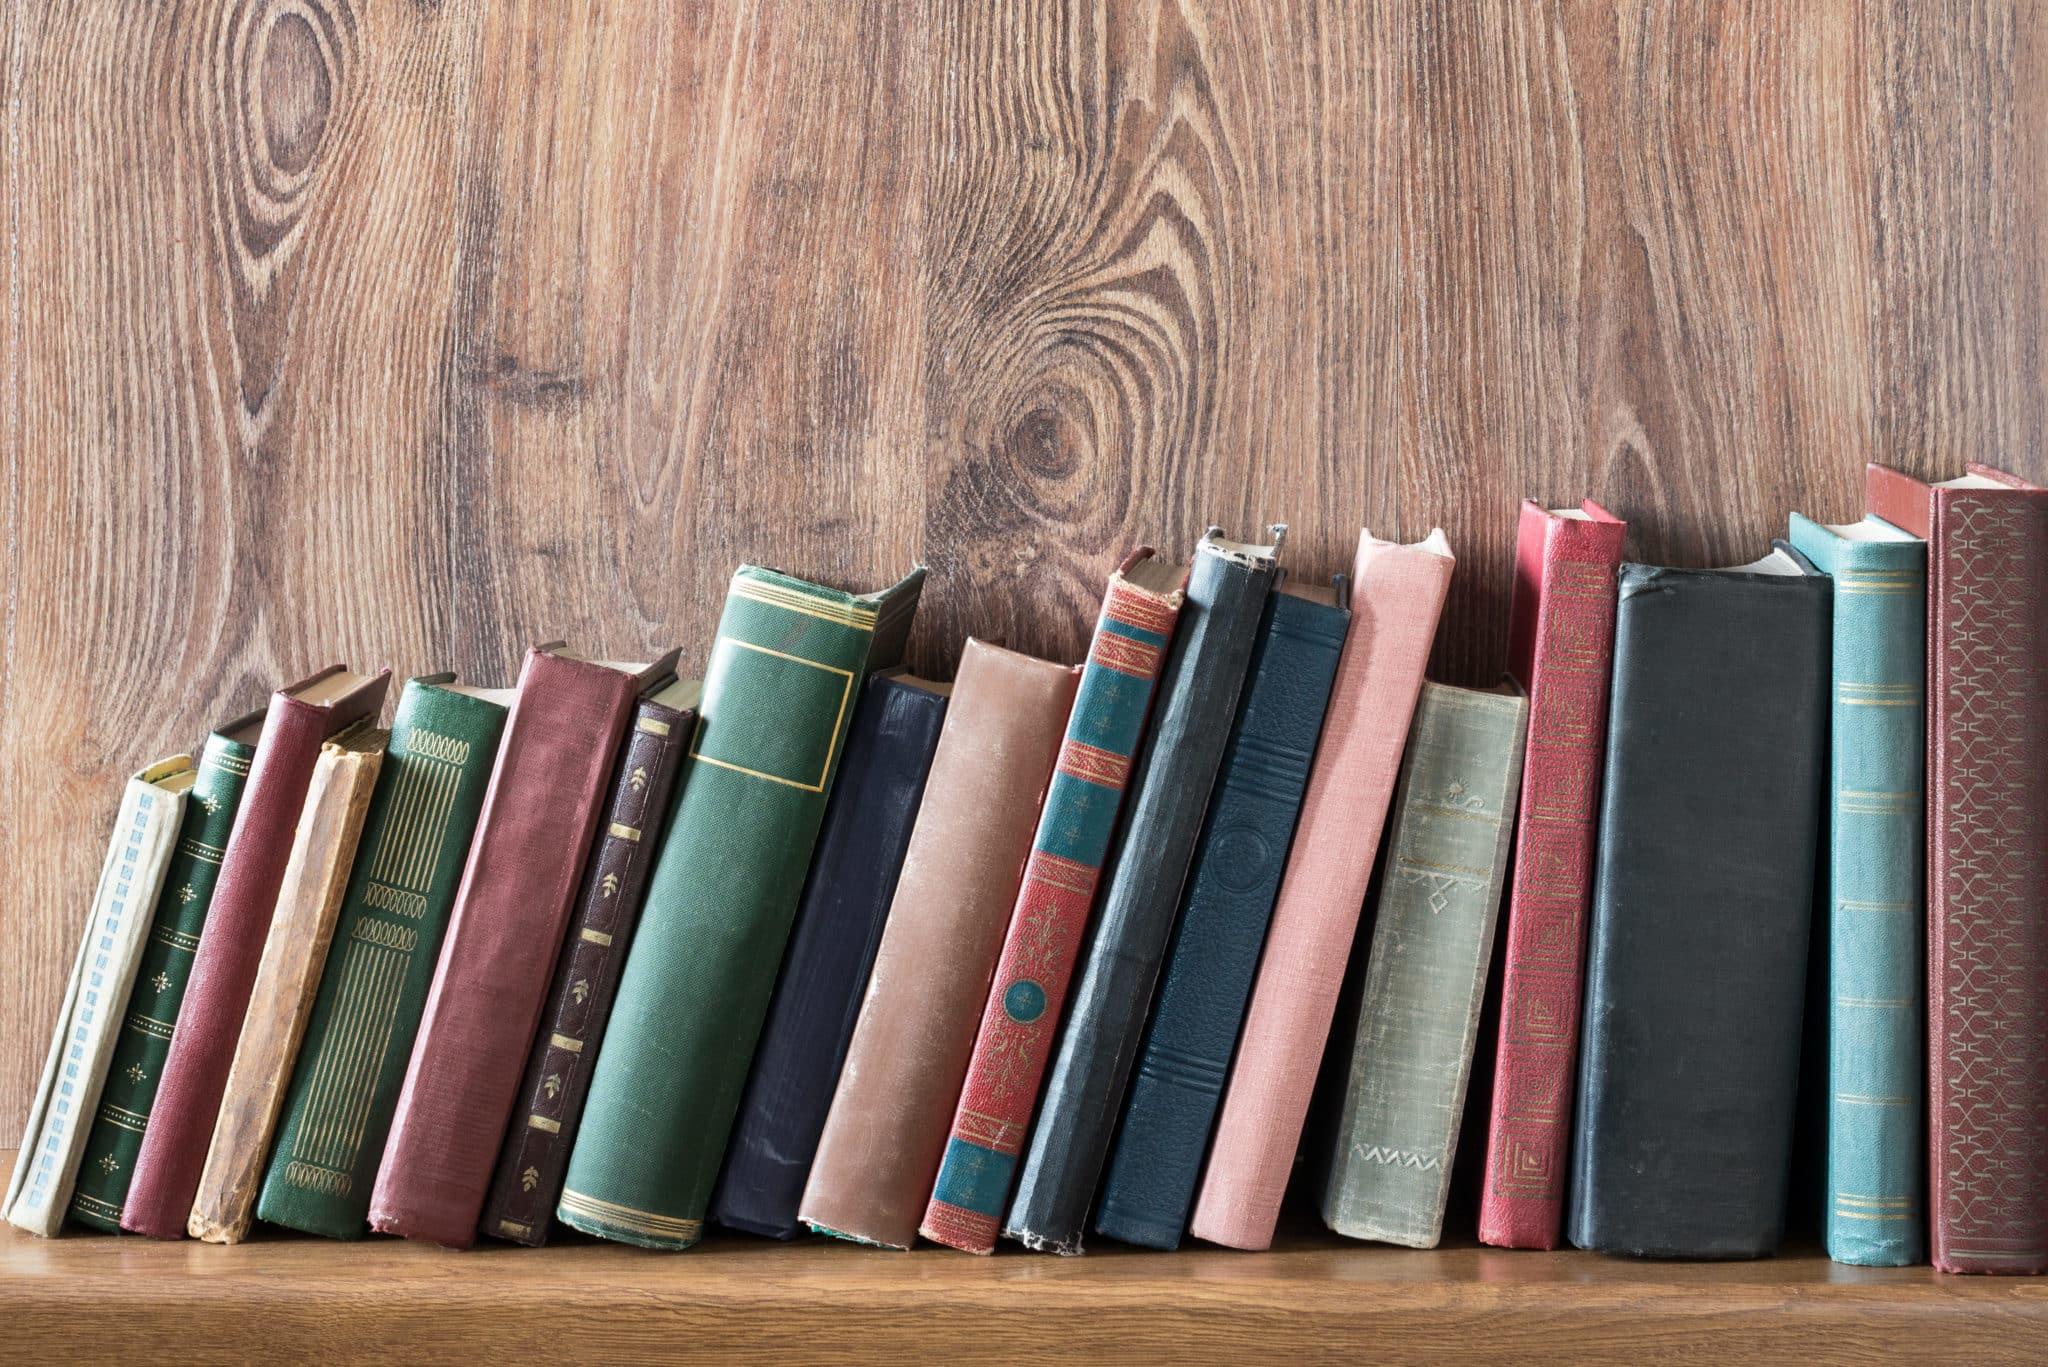 55 Best Self Help Books For Women | Clever Girl Finance